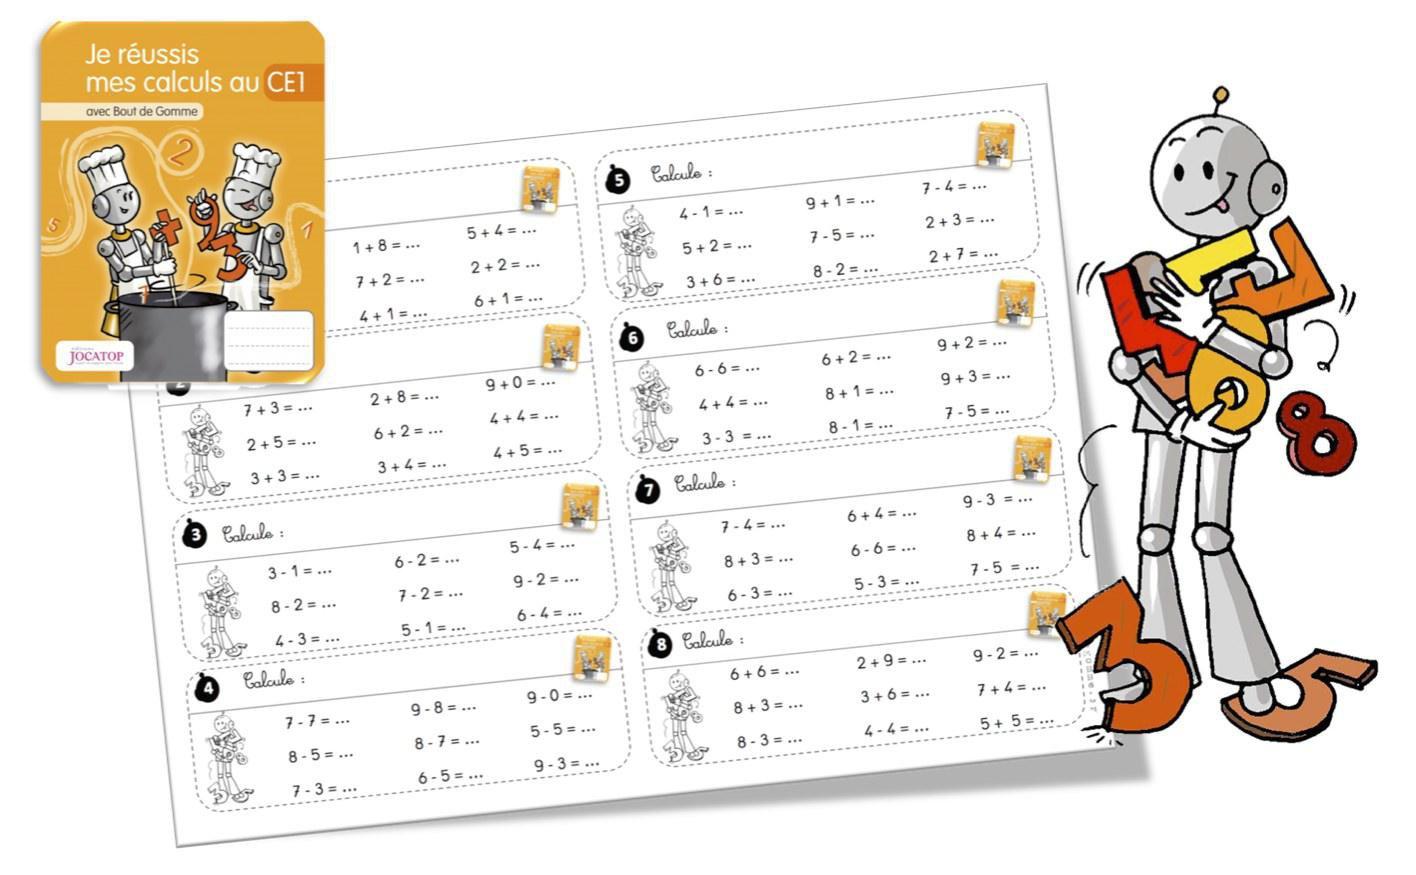 Rituels calcul avec les cahiers de calcul Jocatop CE1 par ...